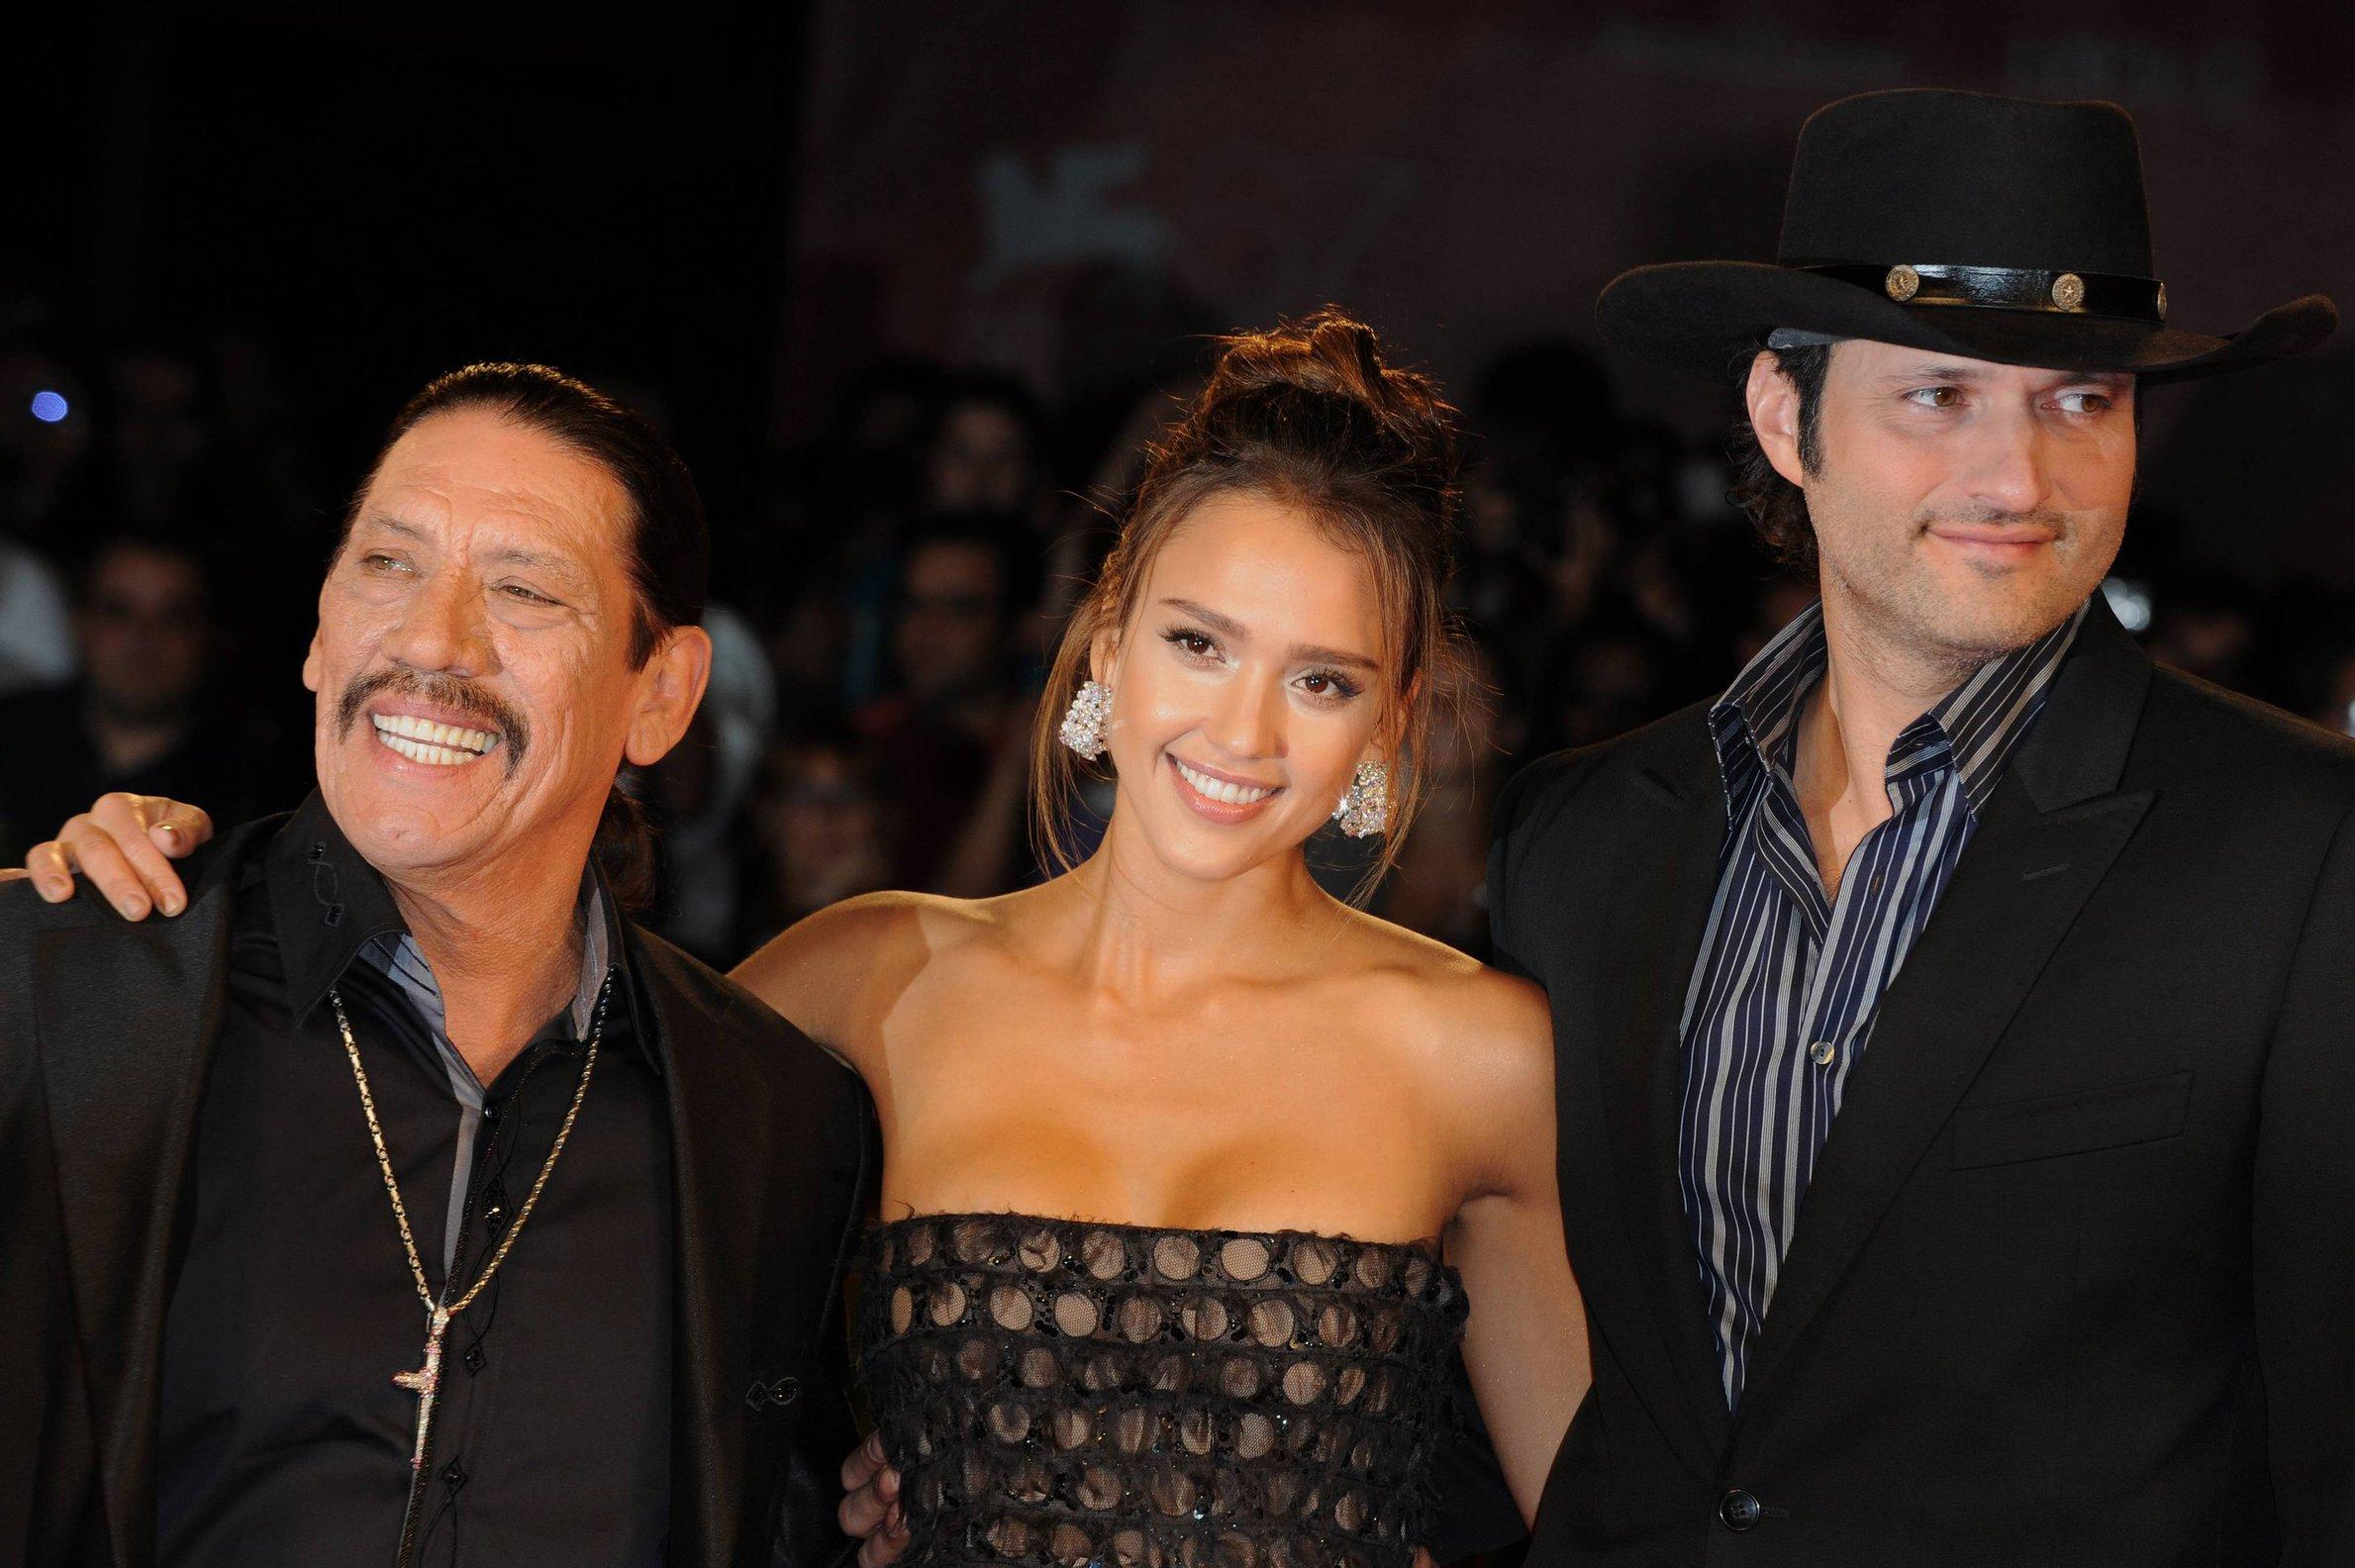 Paula Nievas And Jessica Dating Danny Trejo Alba wagering not unlike